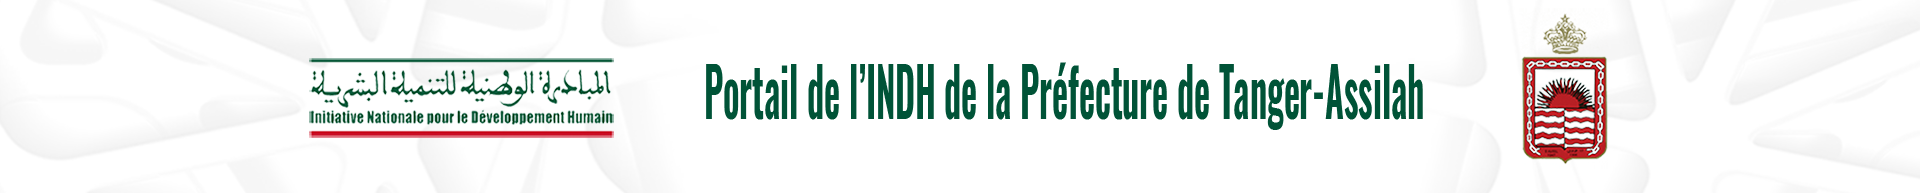 banner-mosaique-header-fr-vfinale